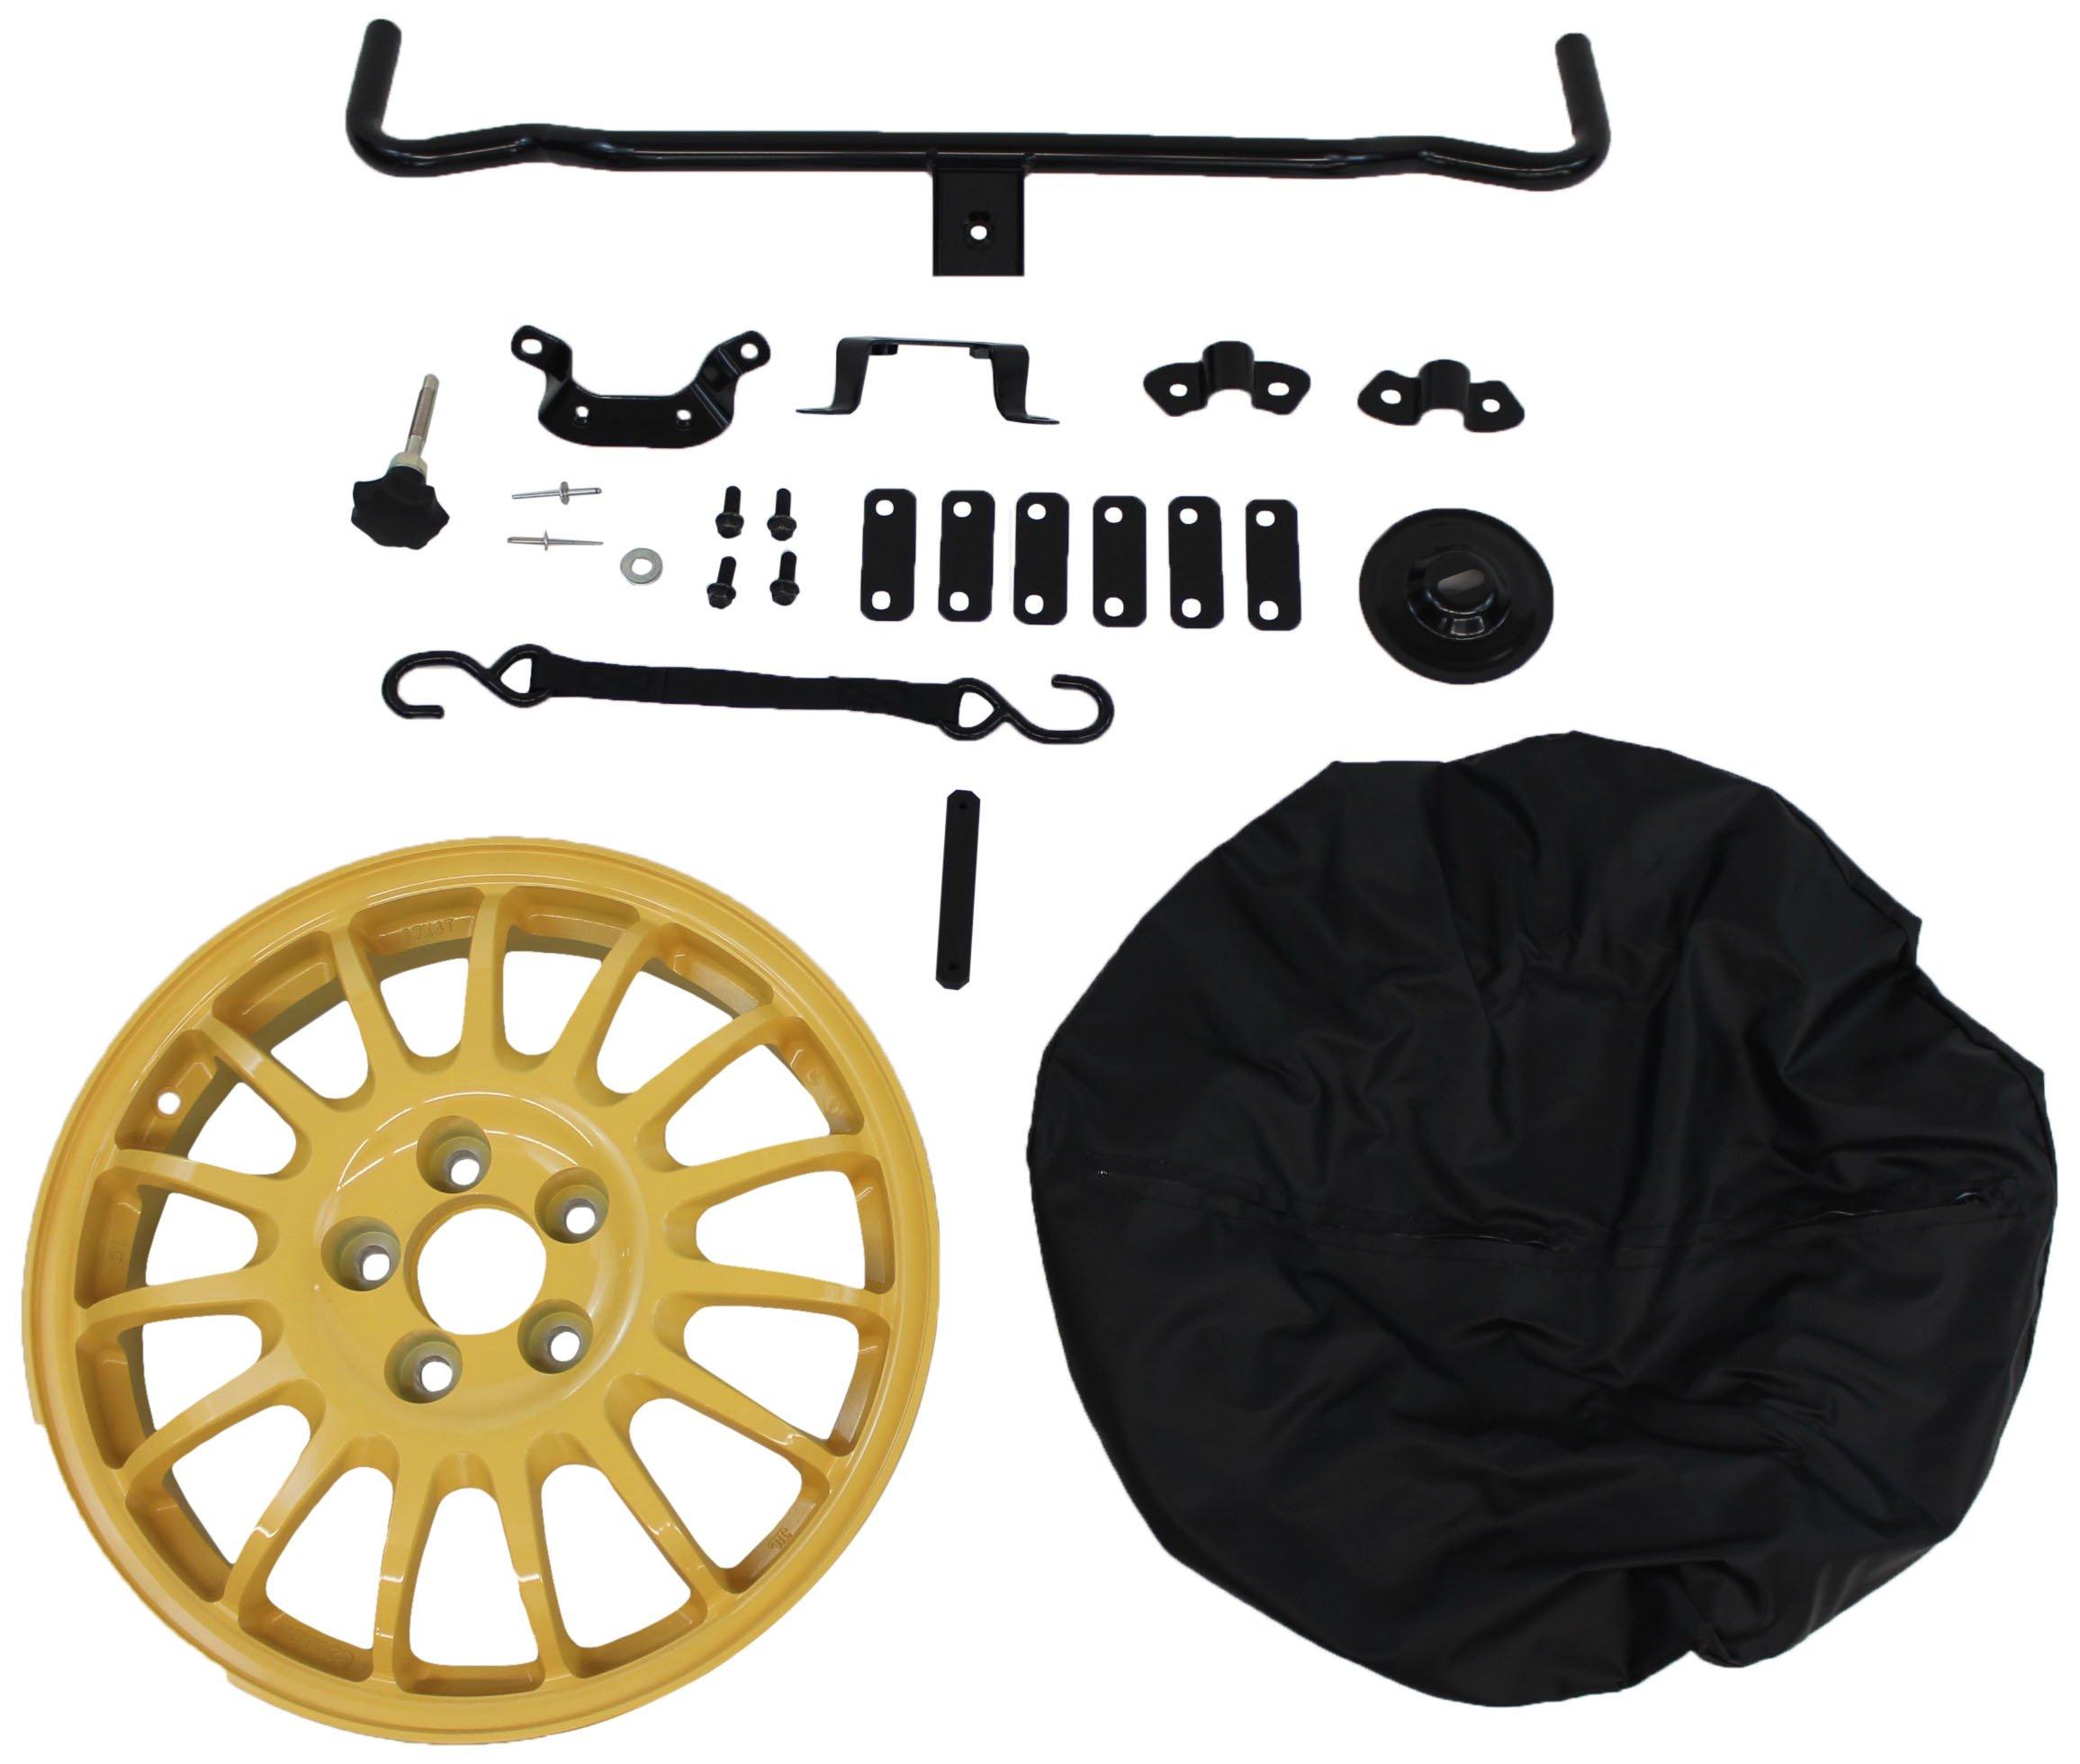 Genuine Mazda Accessories FE01-V8-360 Spare Tire Mounting Kit